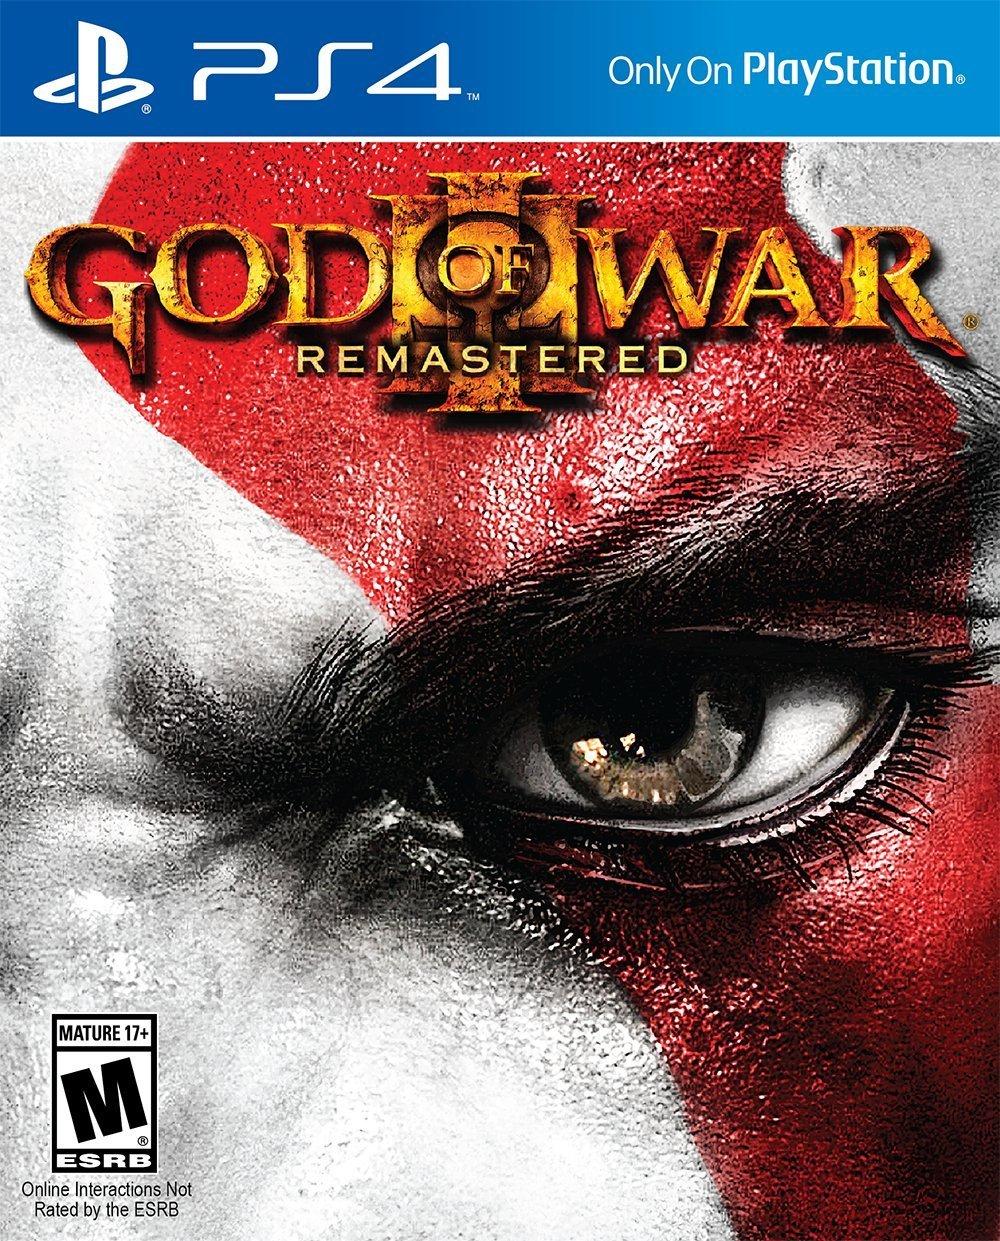 AMAZOM MX: God of war 3 remastered